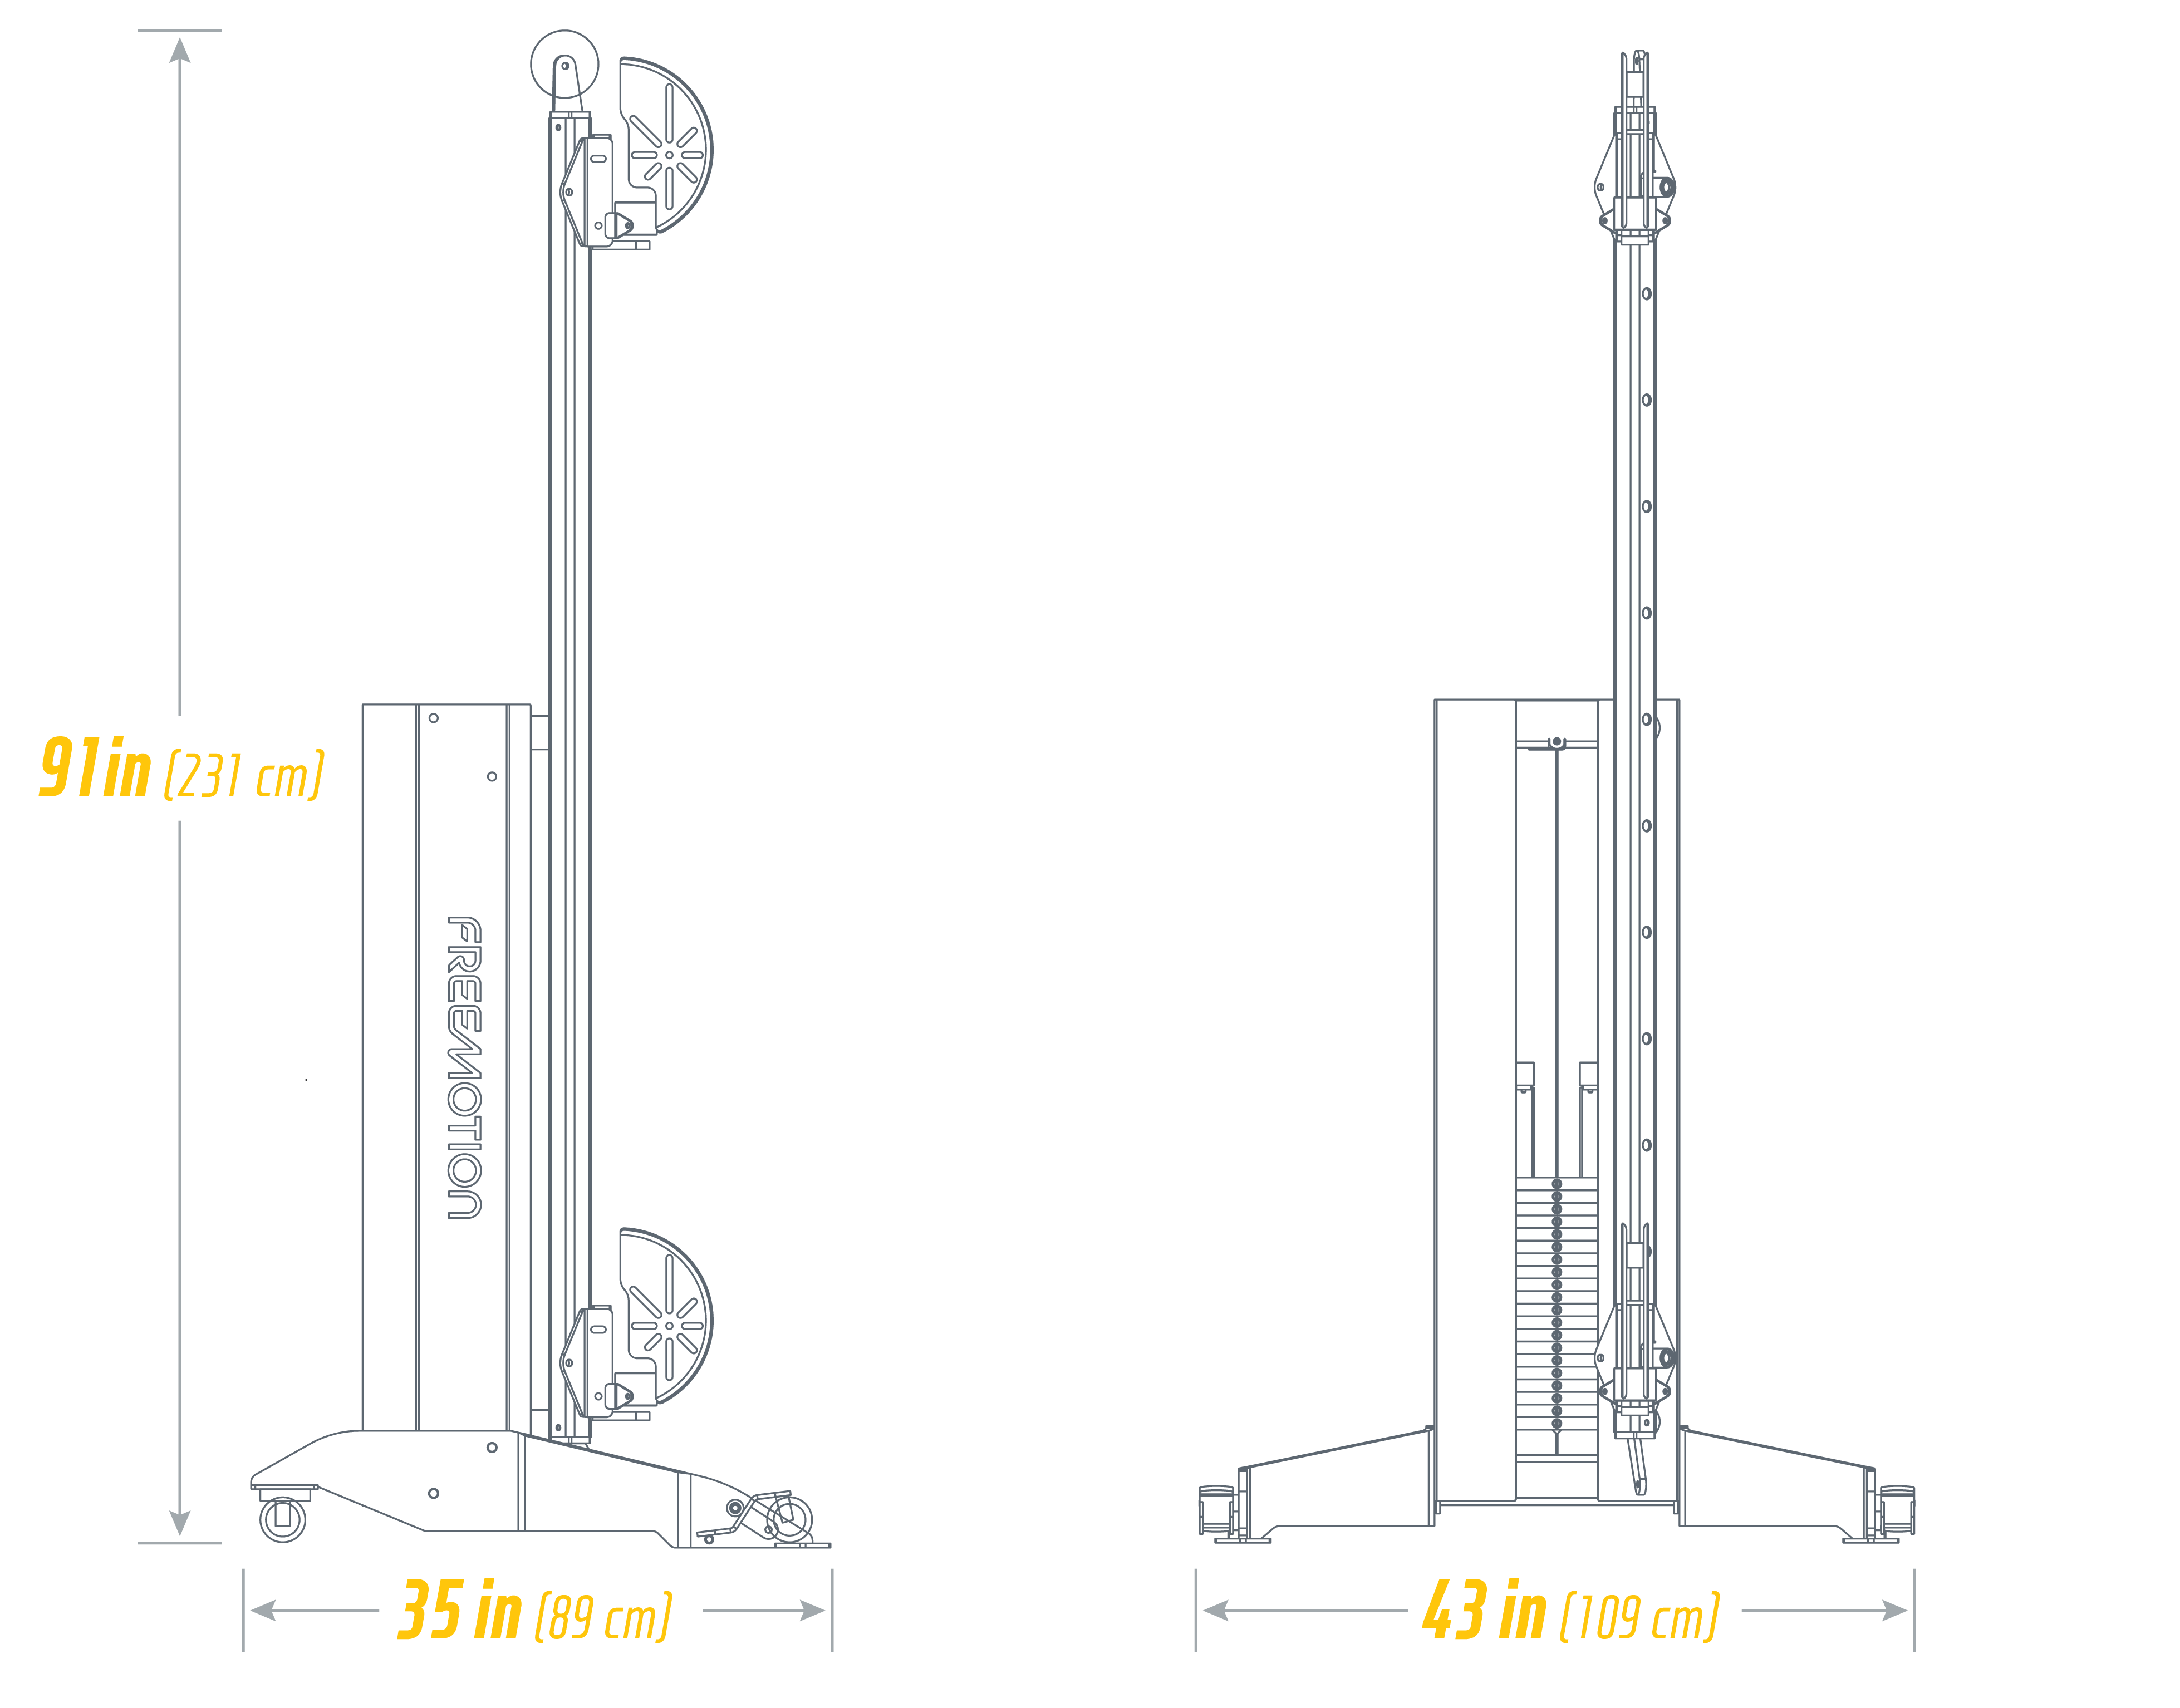 G625 Cable Column Footprint